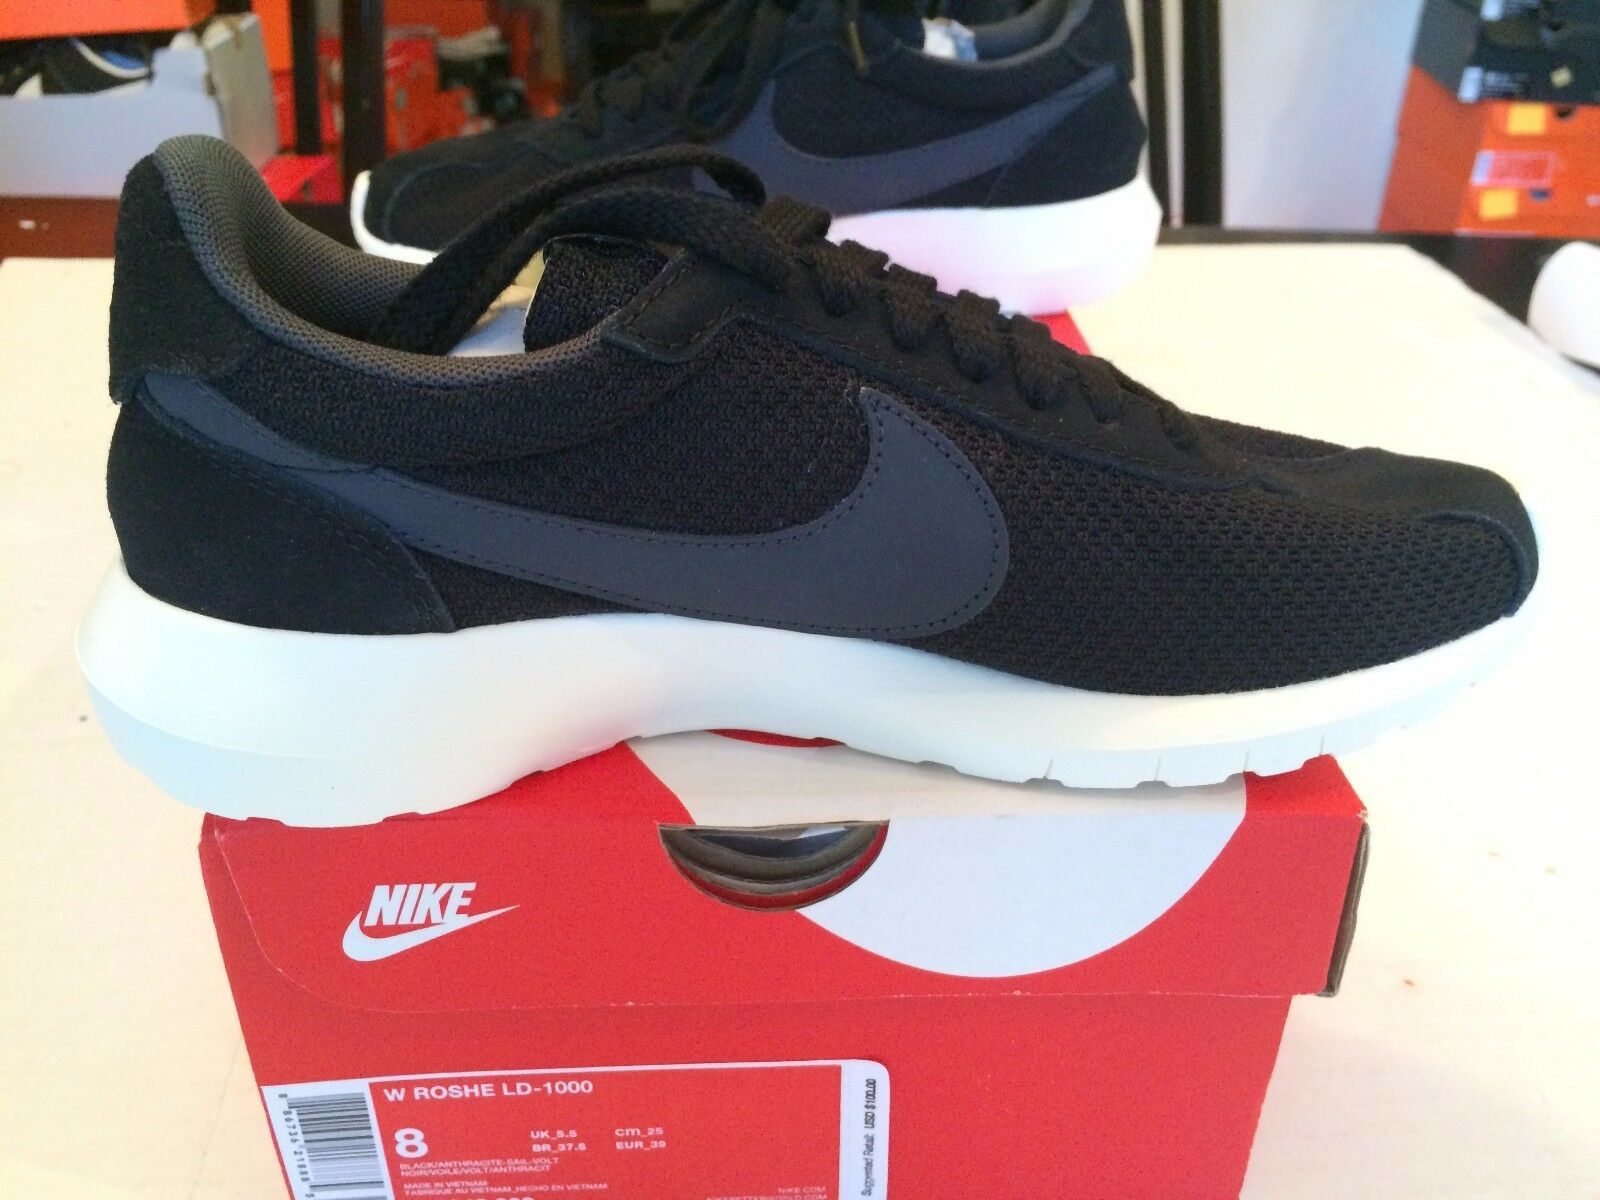 Women's Nike Roshe LD-1000 SZ 8 BLACK/ANTHRACITE-SAIL-VOLT   819843-003